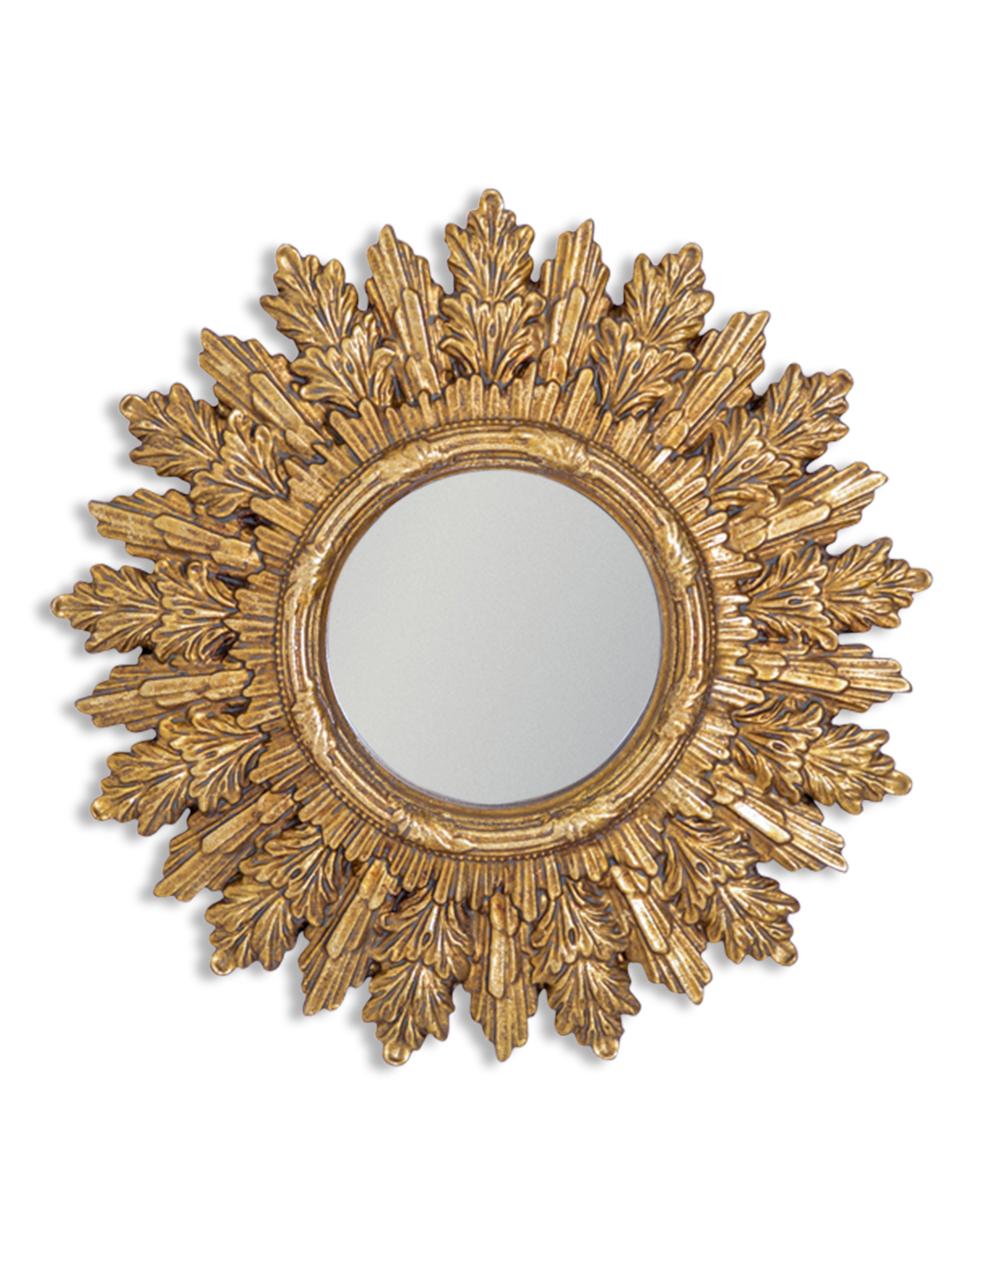 Antique Gold Mixed leaf Convex Mirror